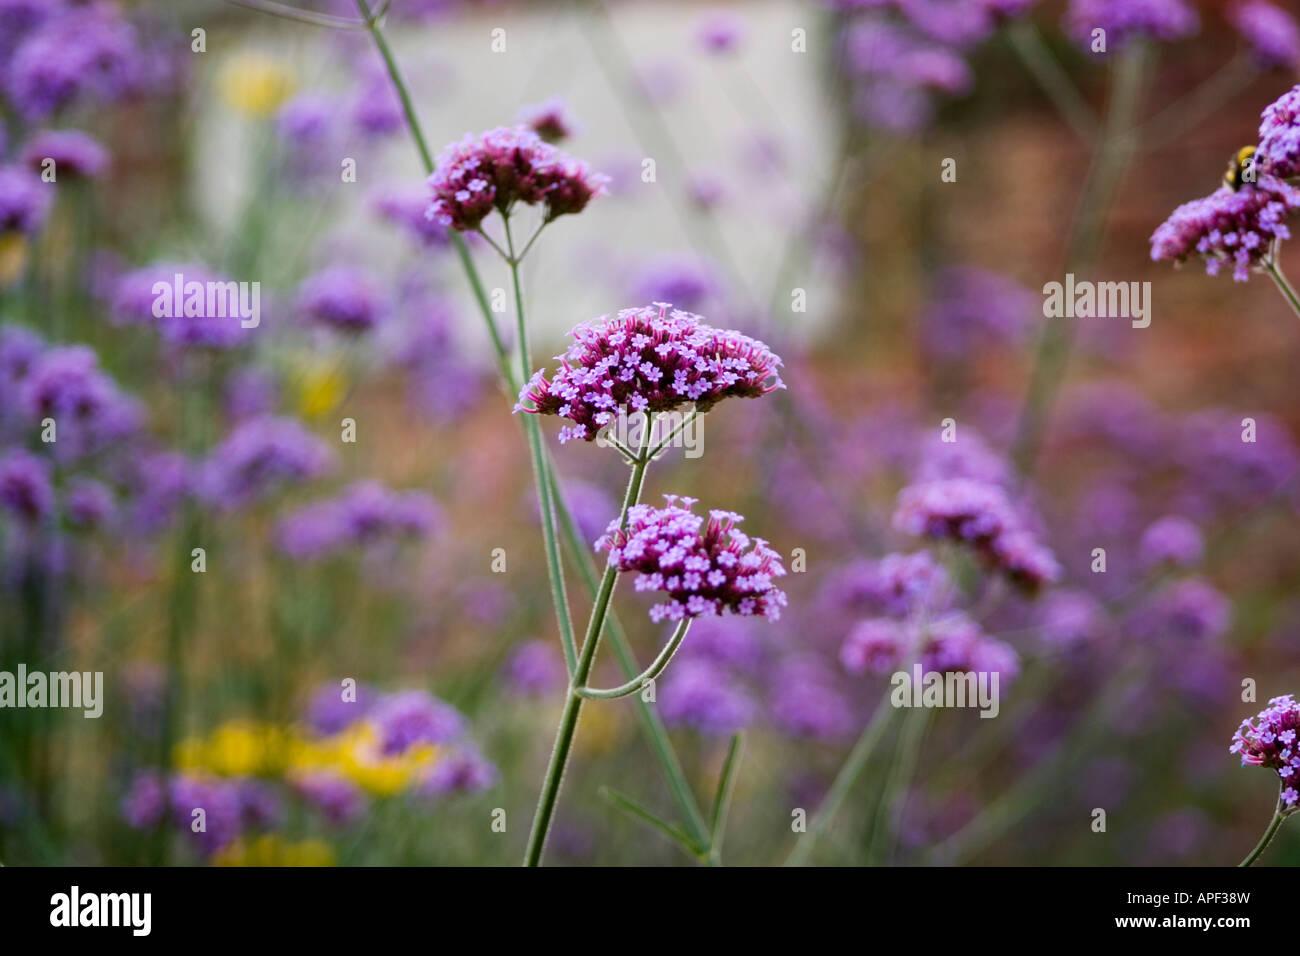 Purple flowers on tall stems stock photo 15772056 alamy purple flowers on tall stems mightylinksfo